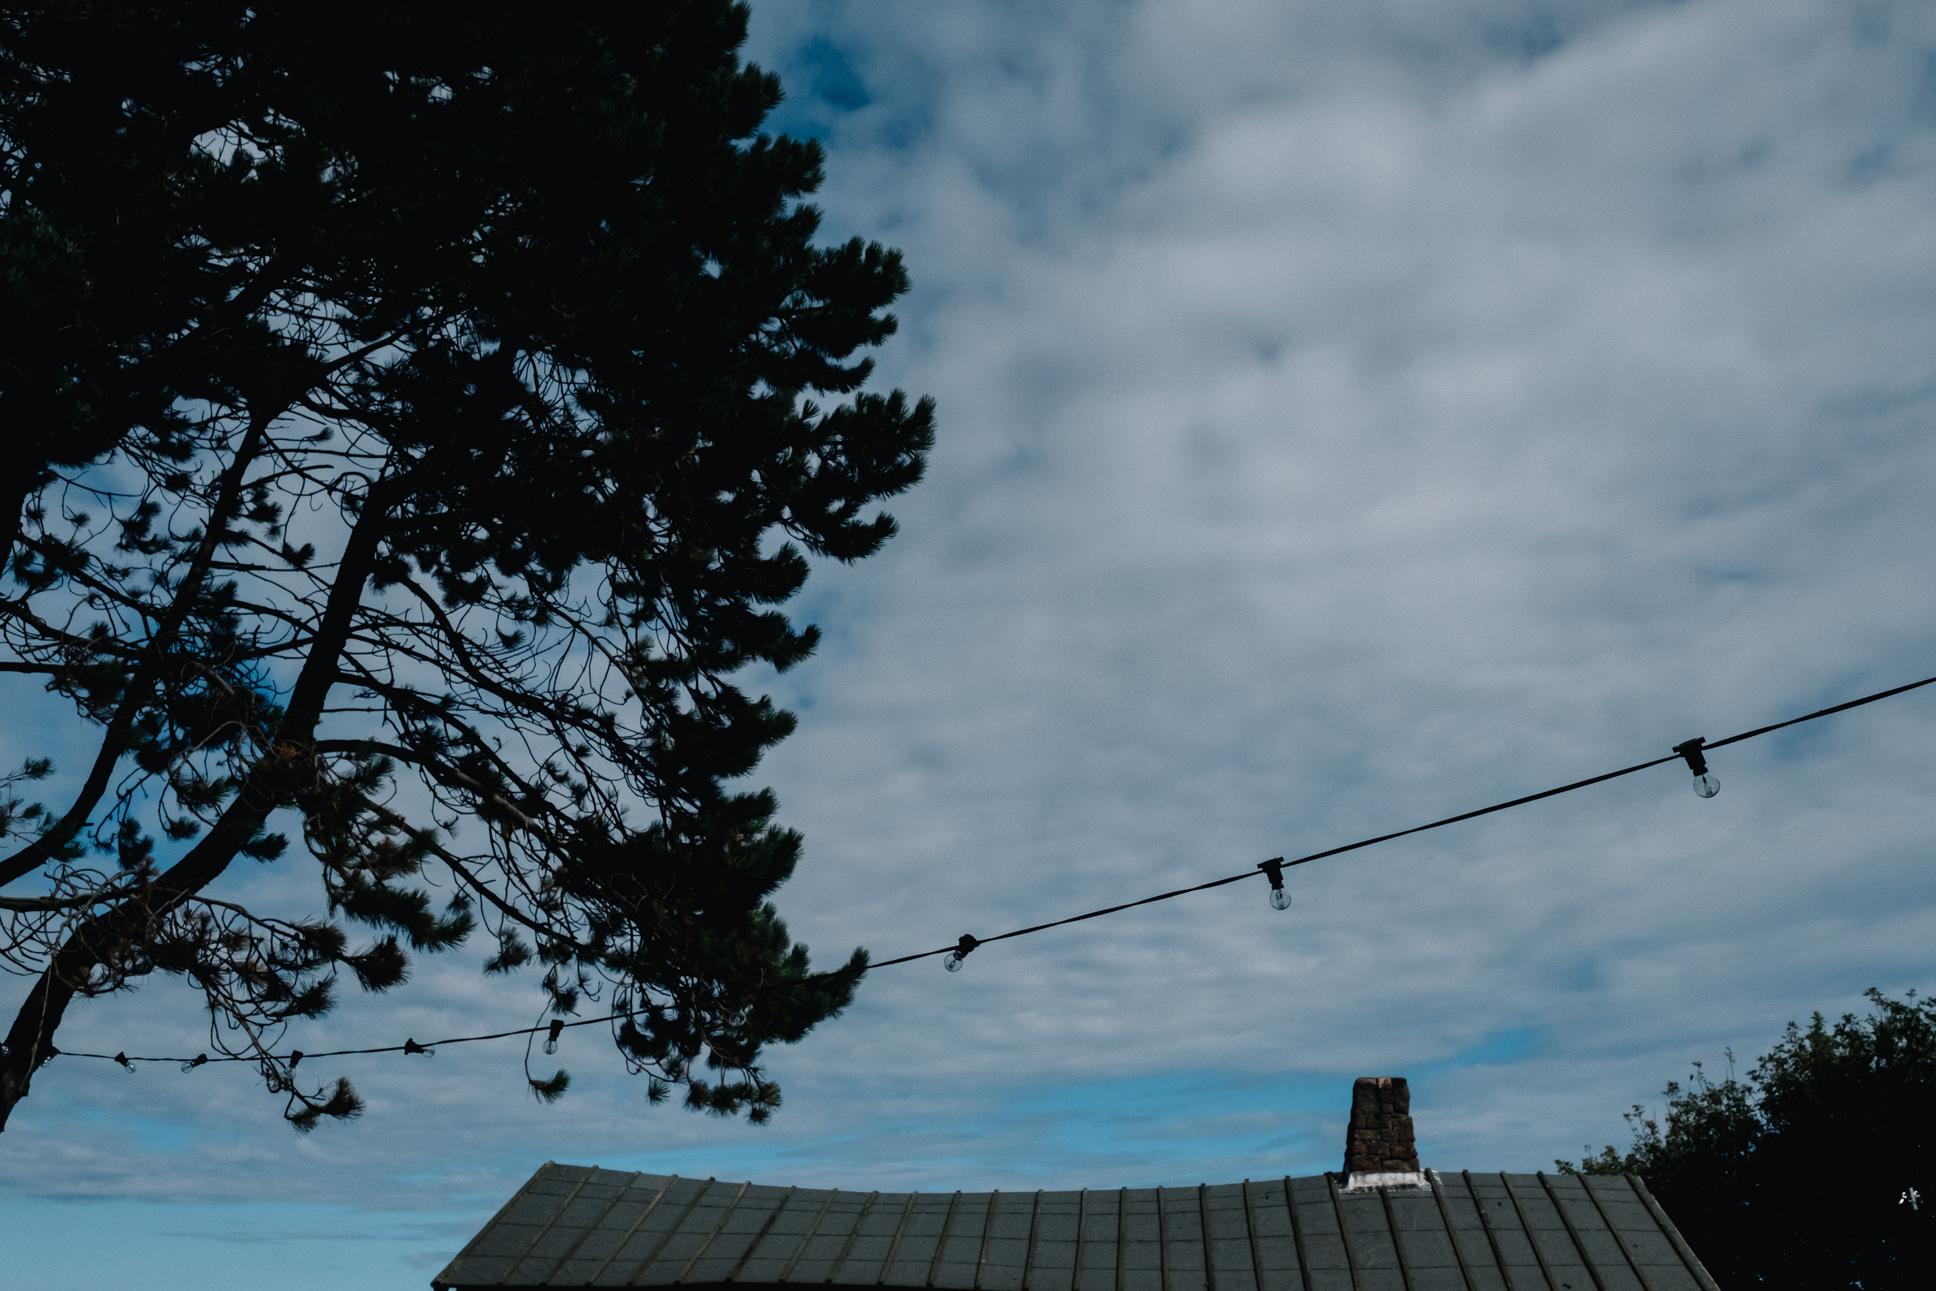 Blue skies over the log cabin at Dunbar and festoon lighting.